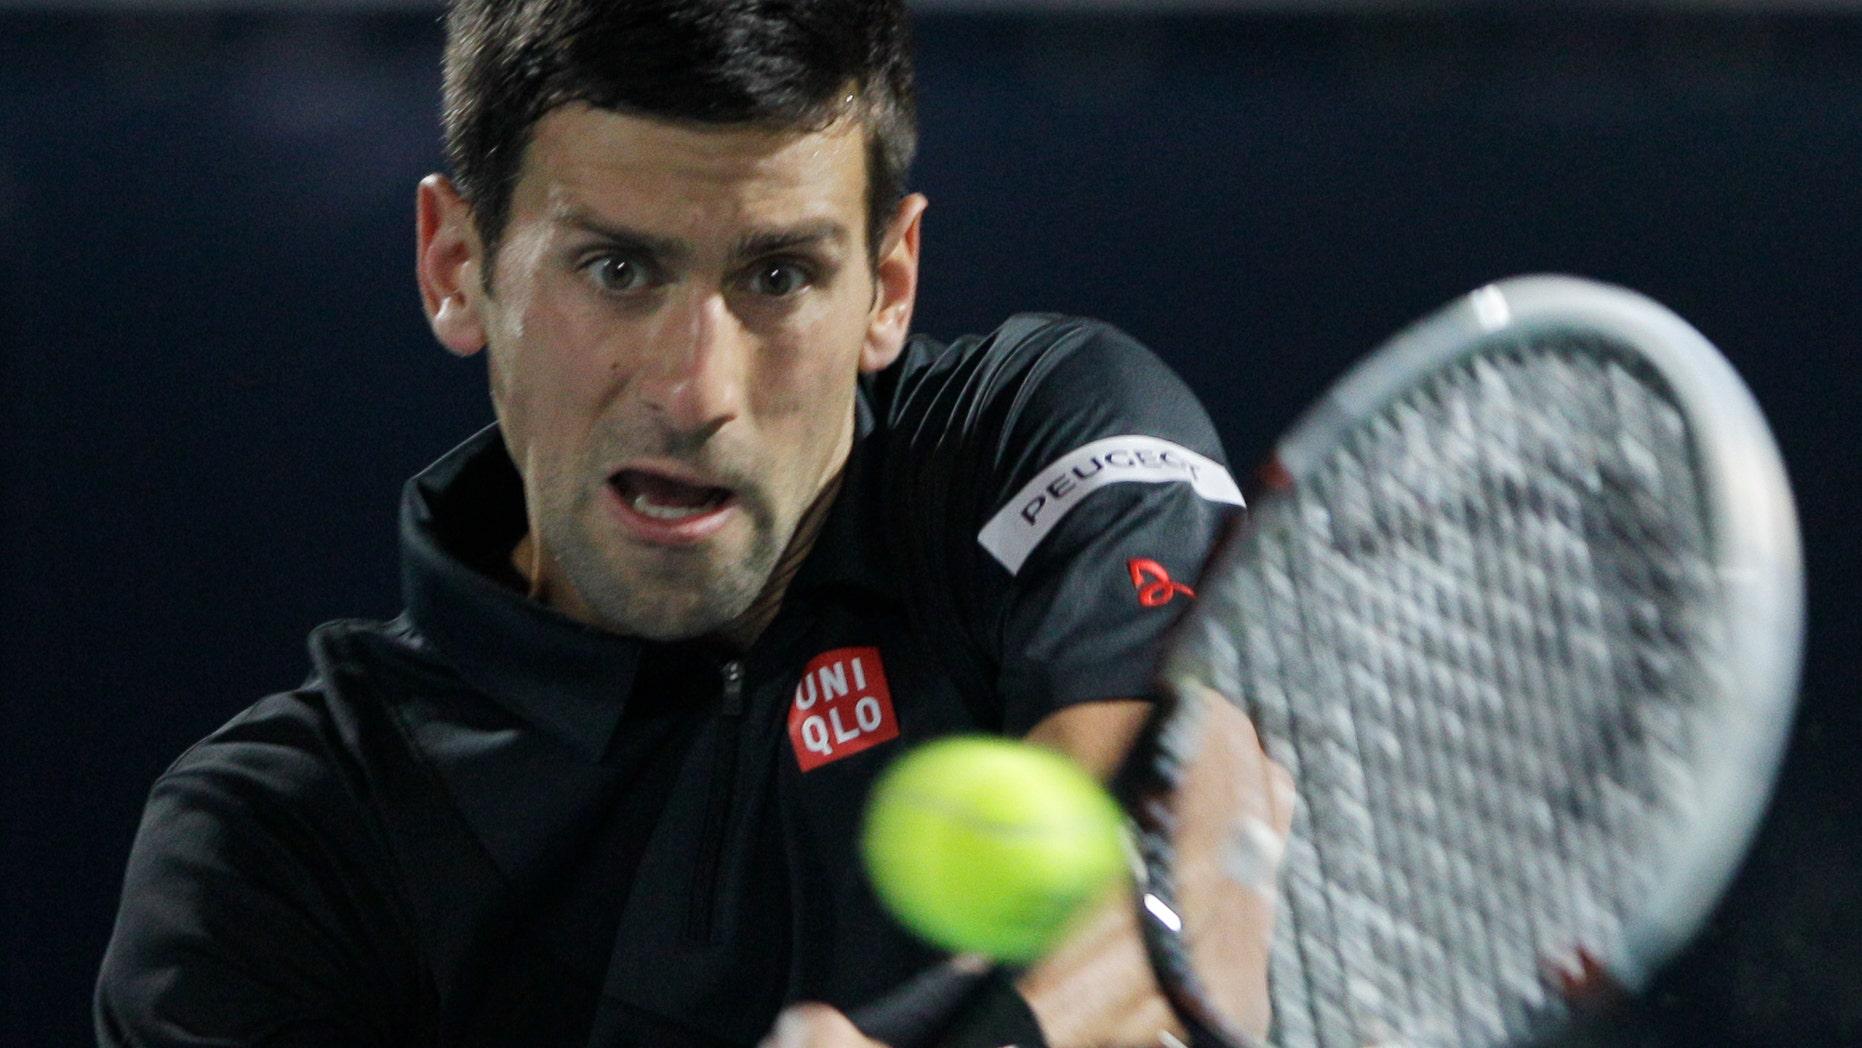 Novak Djokovic of Serbia returns the ball to Spain's Roberto Bautista Agut during the third day of the Dubai Tennis Championships in Dubai, United Arab Emirates, Wednesday, Feb. 26, 2014. (AP Photo/Kamran Jebreili)